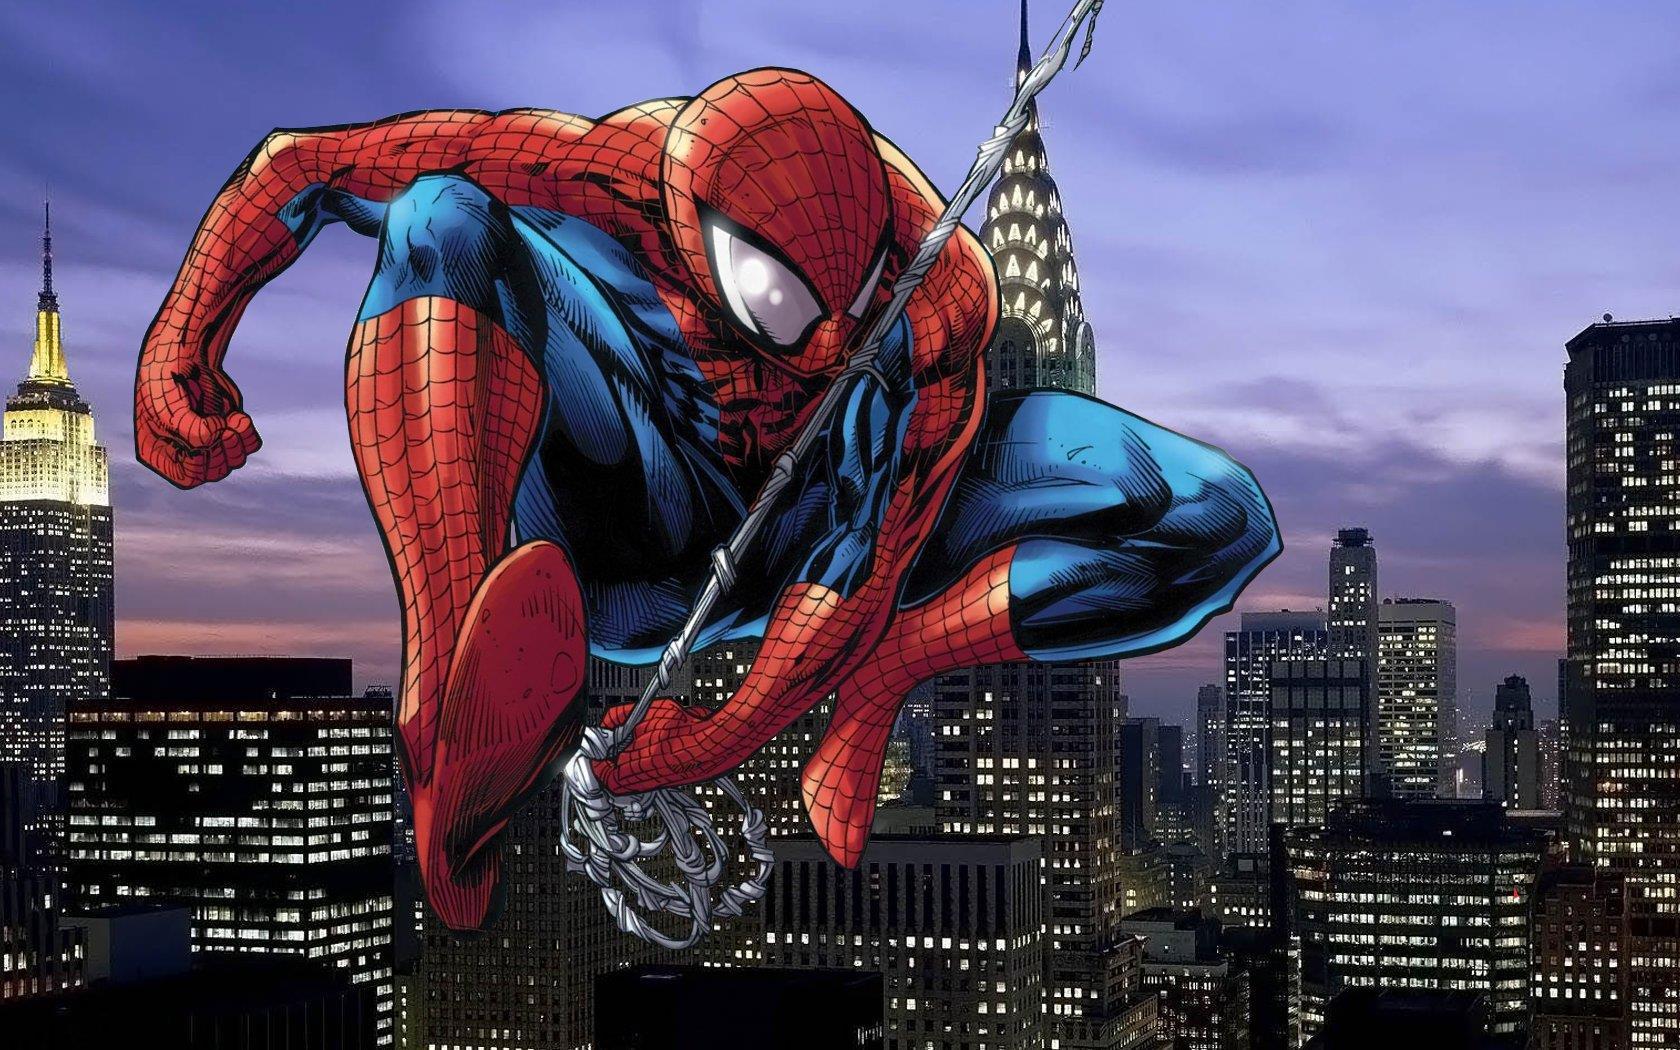 Spiderman wallpapers HDwallpapers fonds dcran gratuits 1680x1050